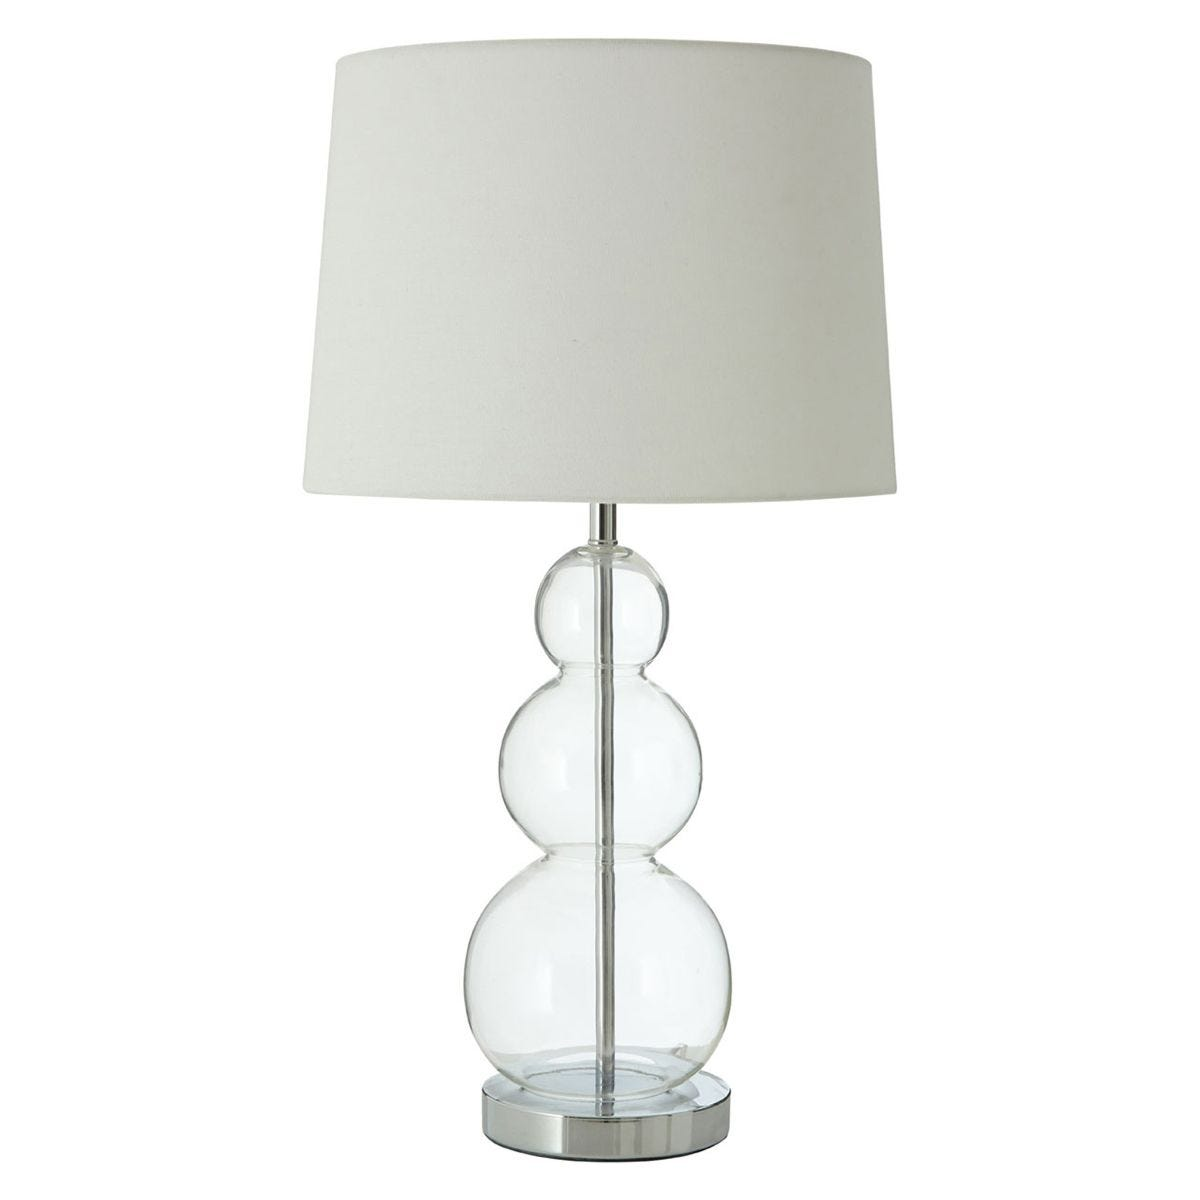 Premier Housewares Luke Table Lamp with Glass Ball, Metal & Fabric Shade